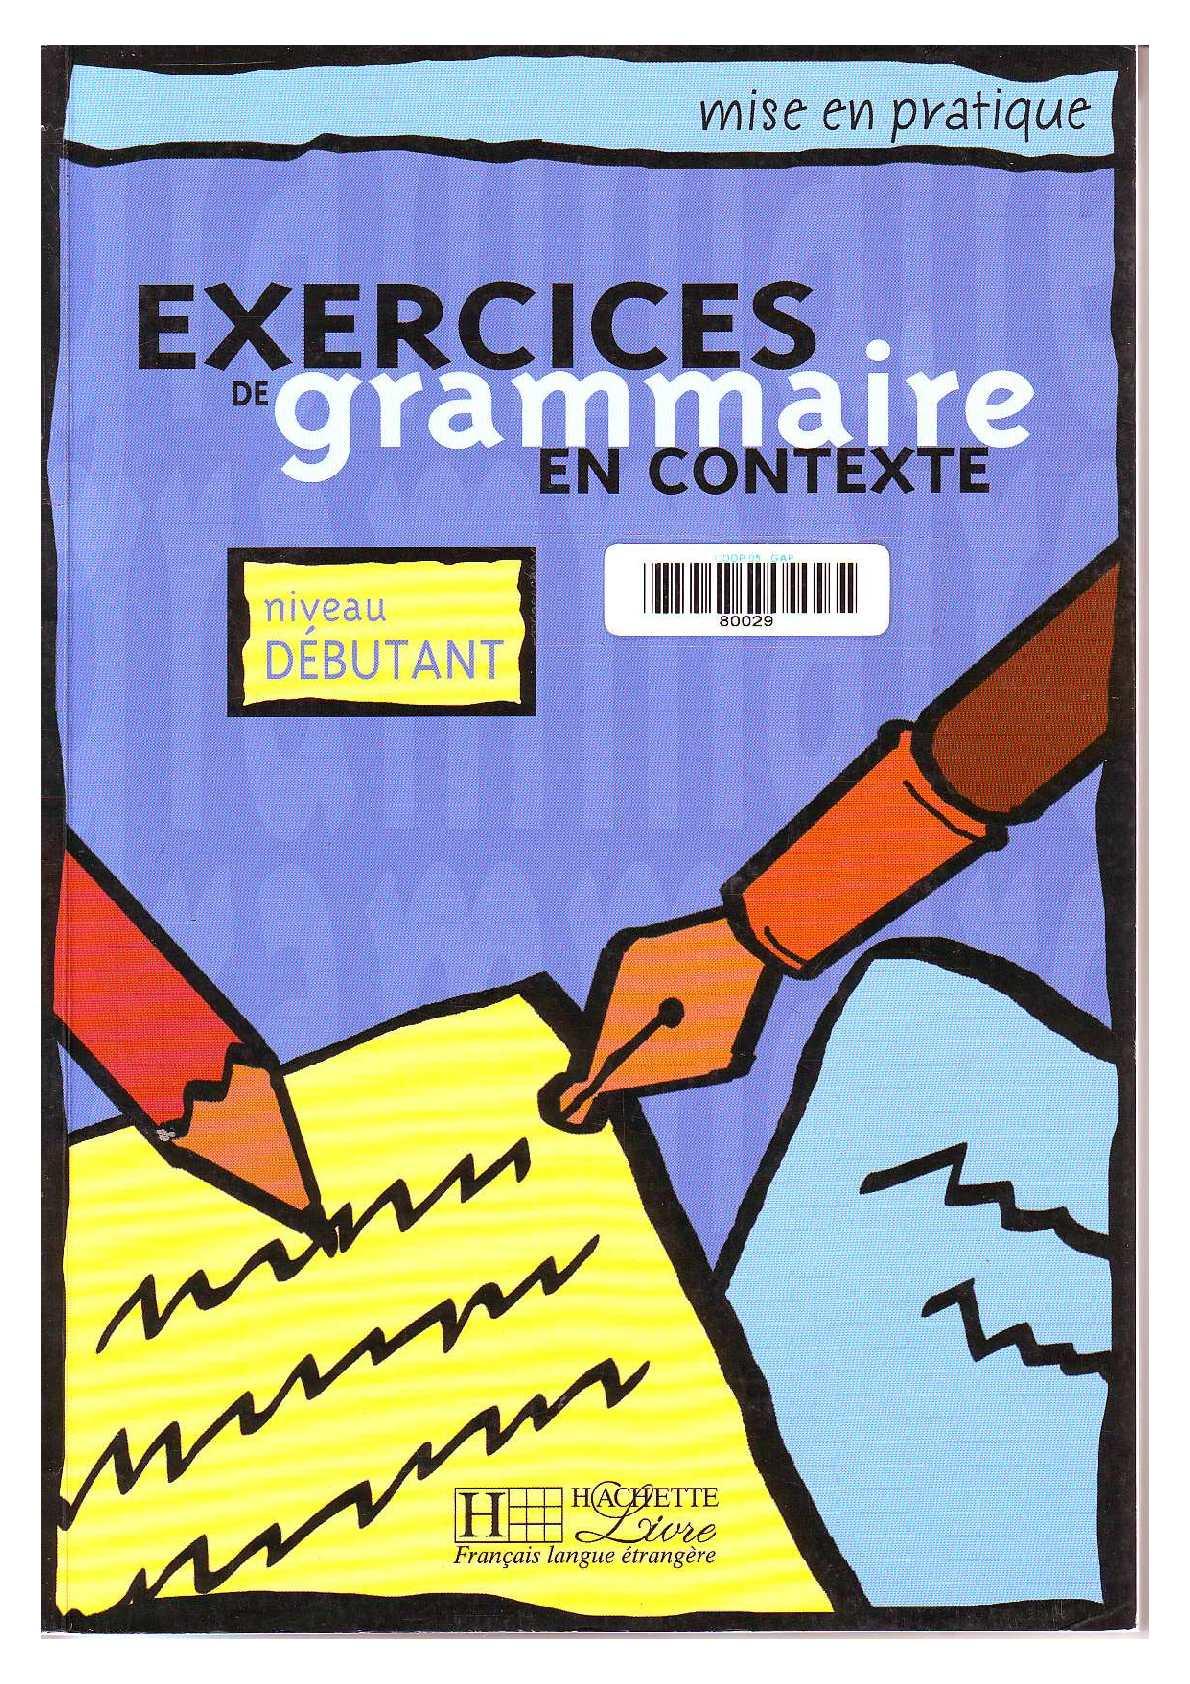 exercices de grammaire en contexte niveau interm?diaire pdf free